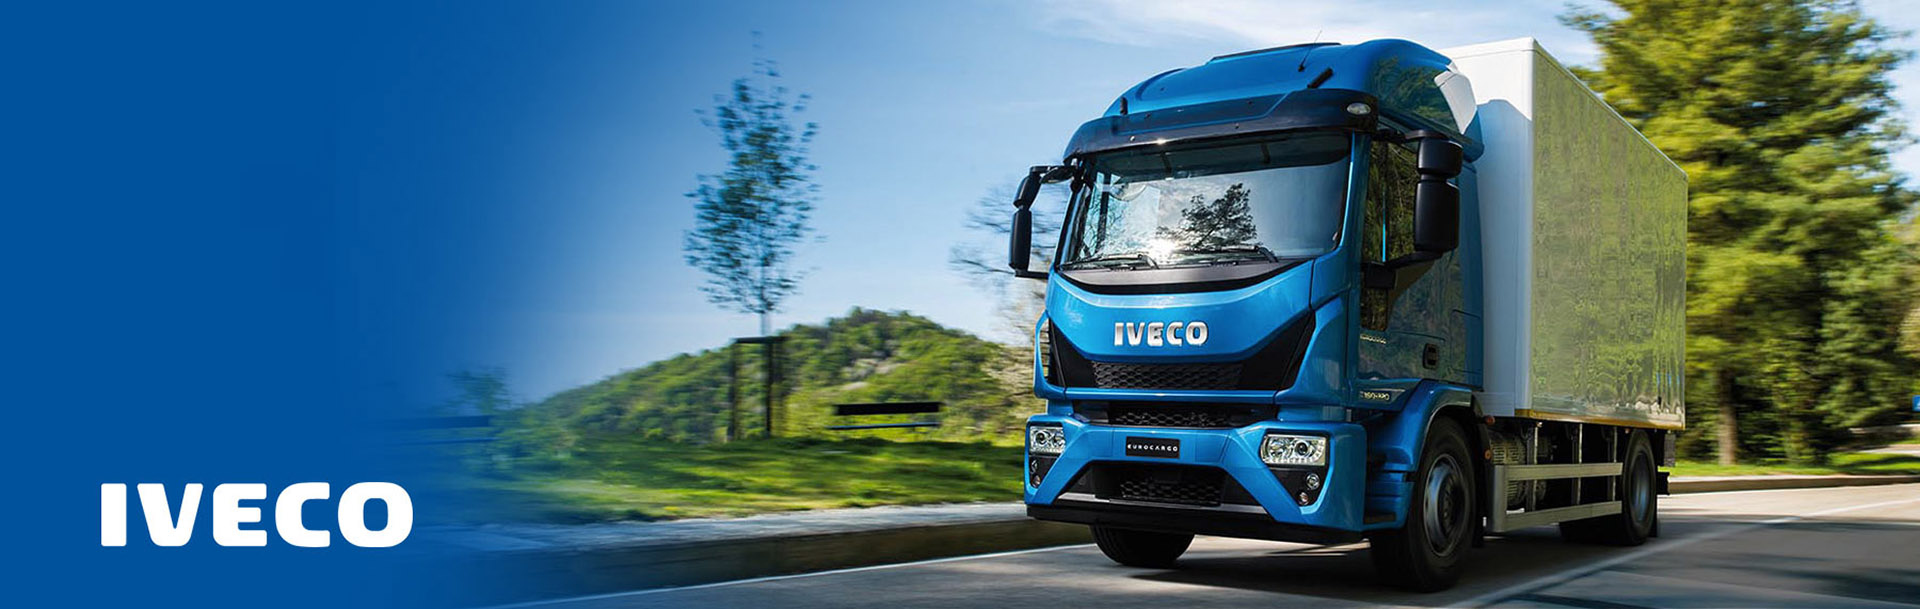 promotions truck-centre-durban-iveco-eurocargo-multi-mission-truck